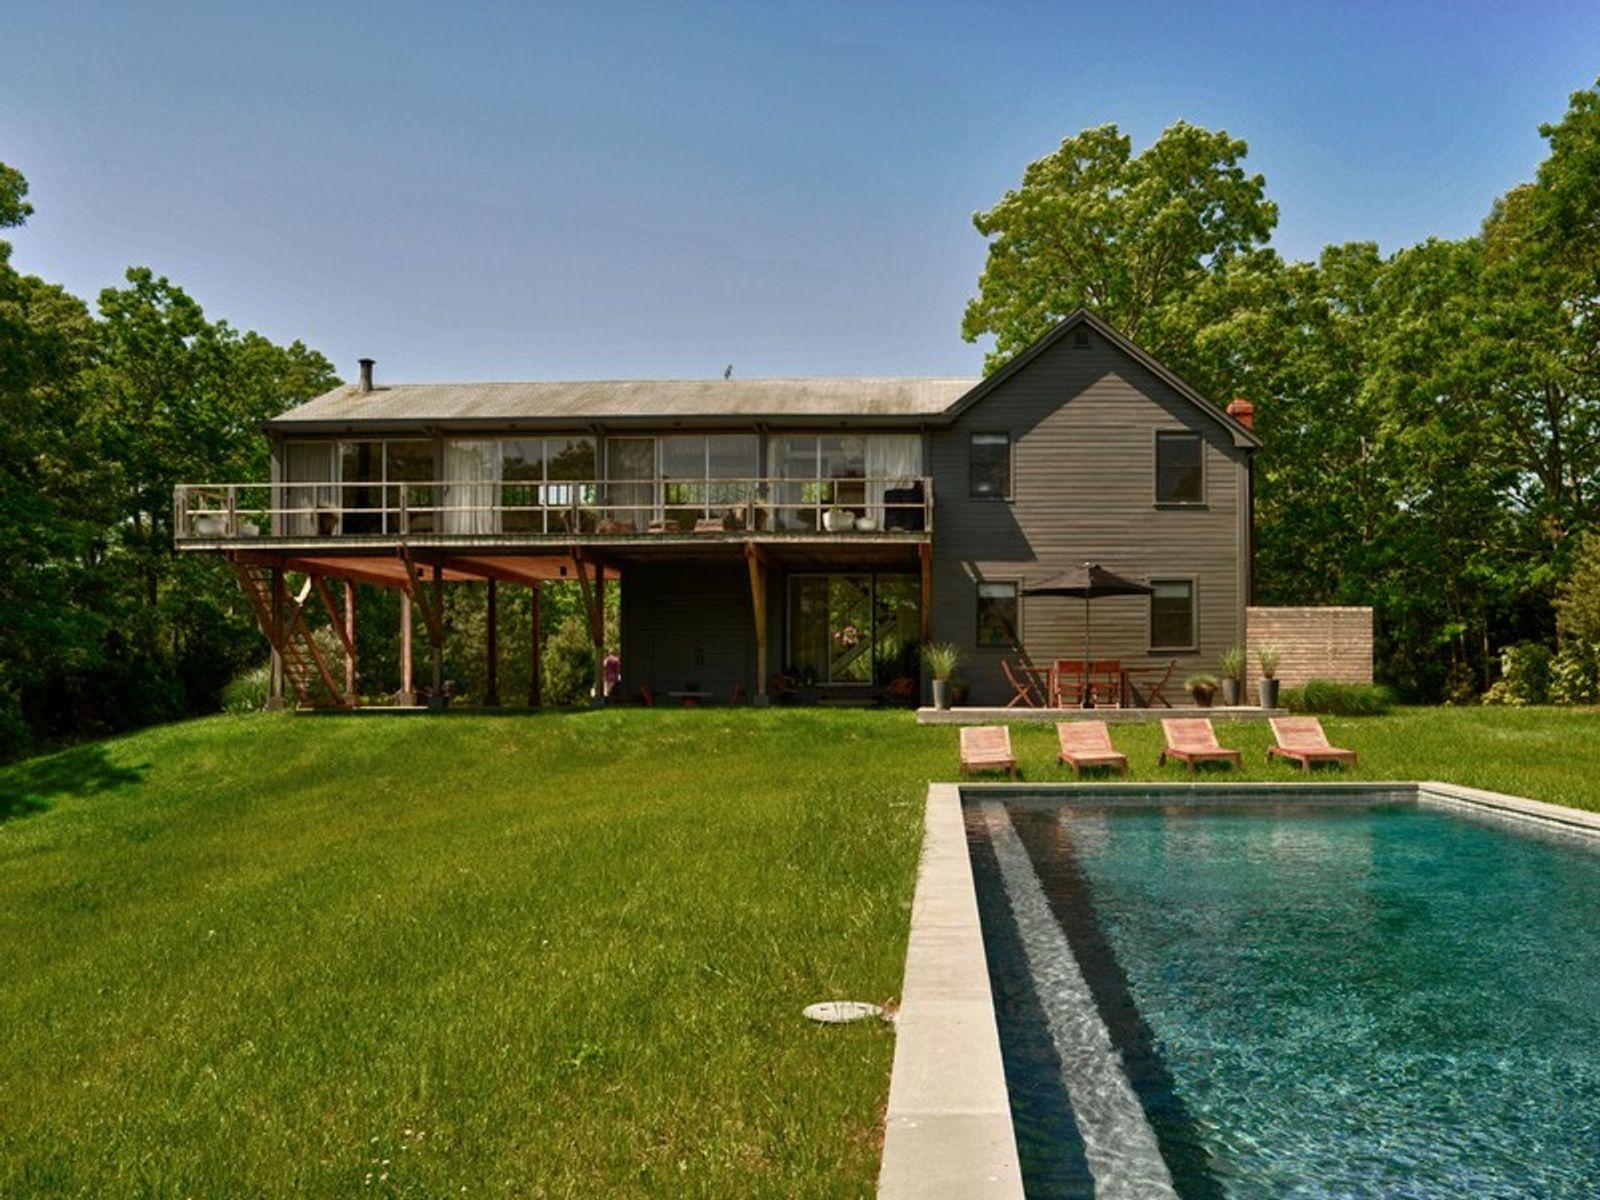 Modernist farm house east hampton ny single family home for Homes for sale east hampton ny